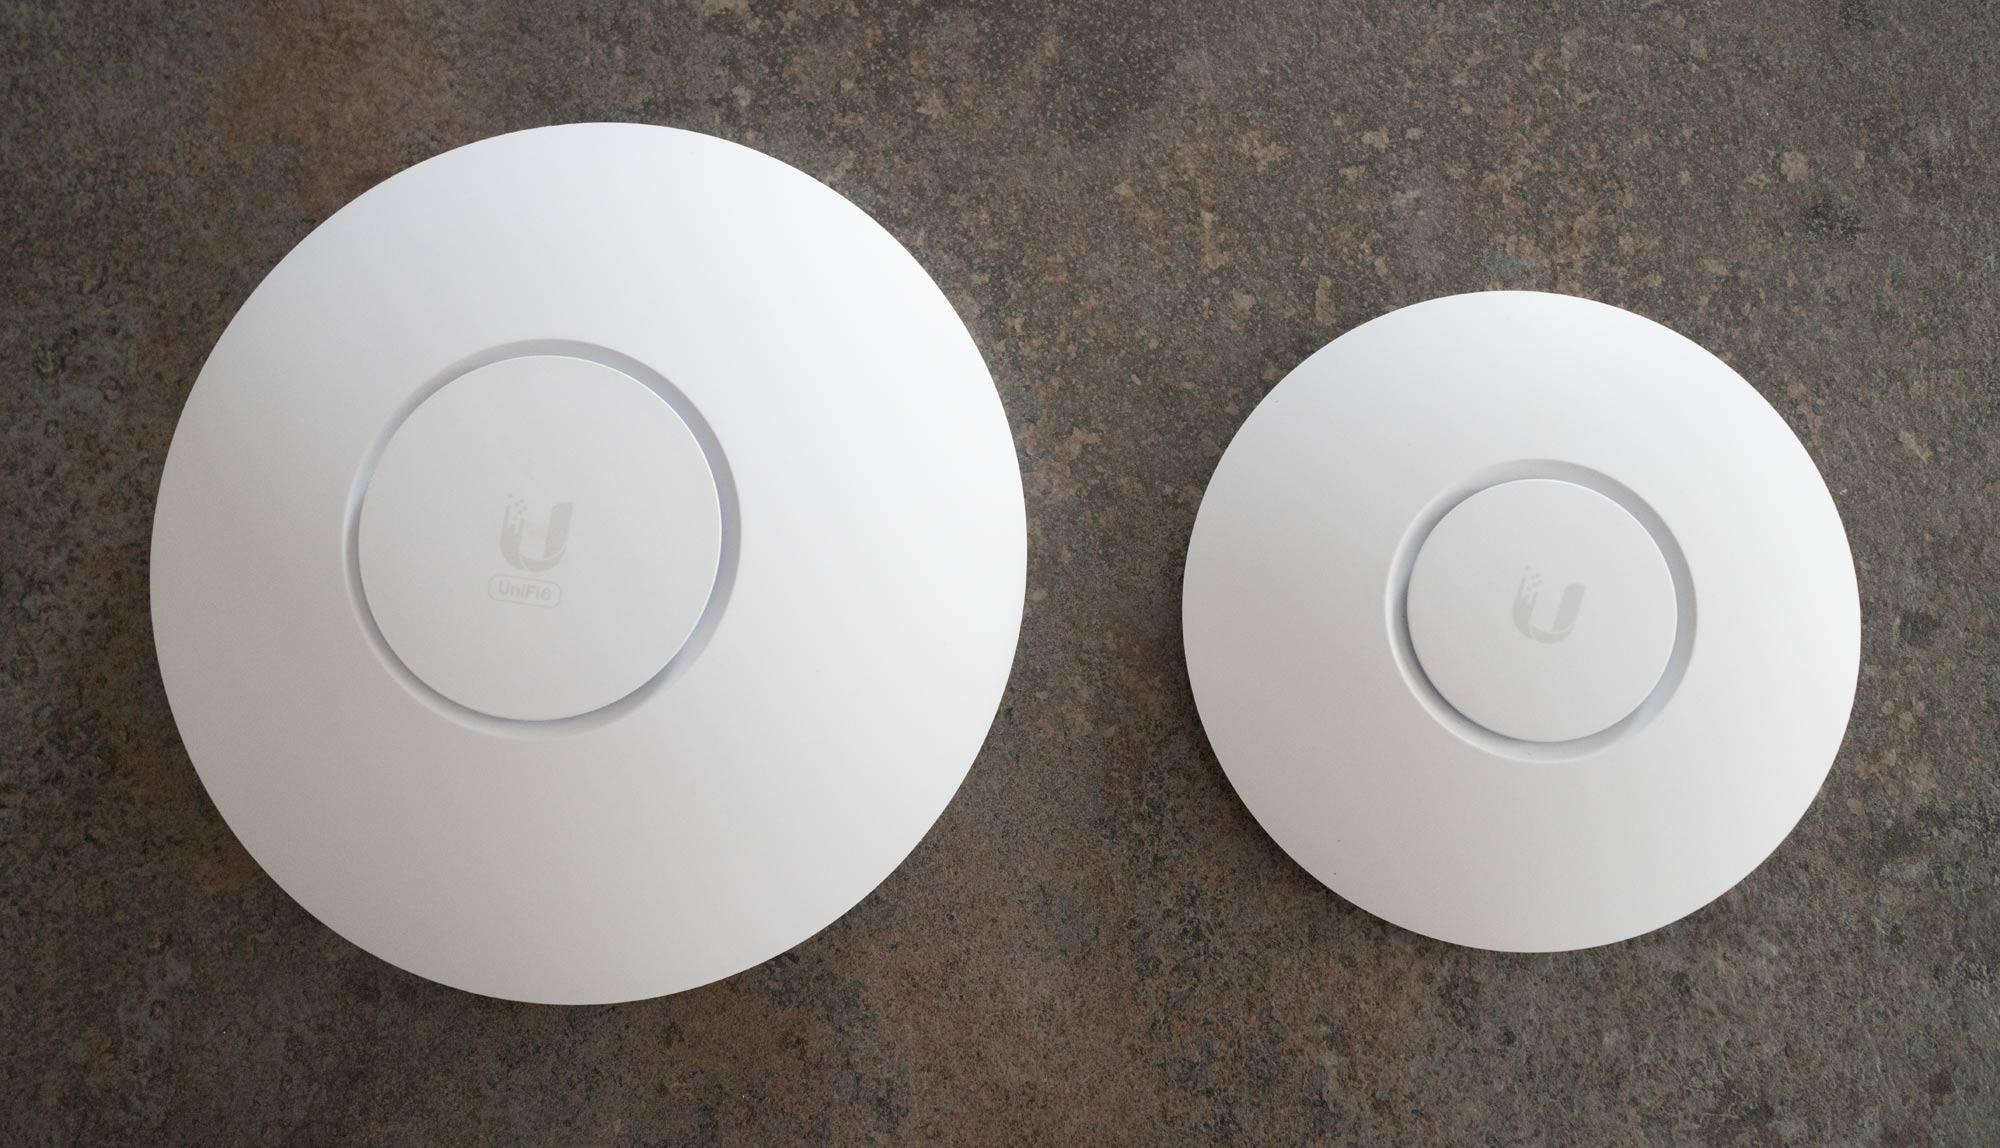 Comparison of UniFi devices